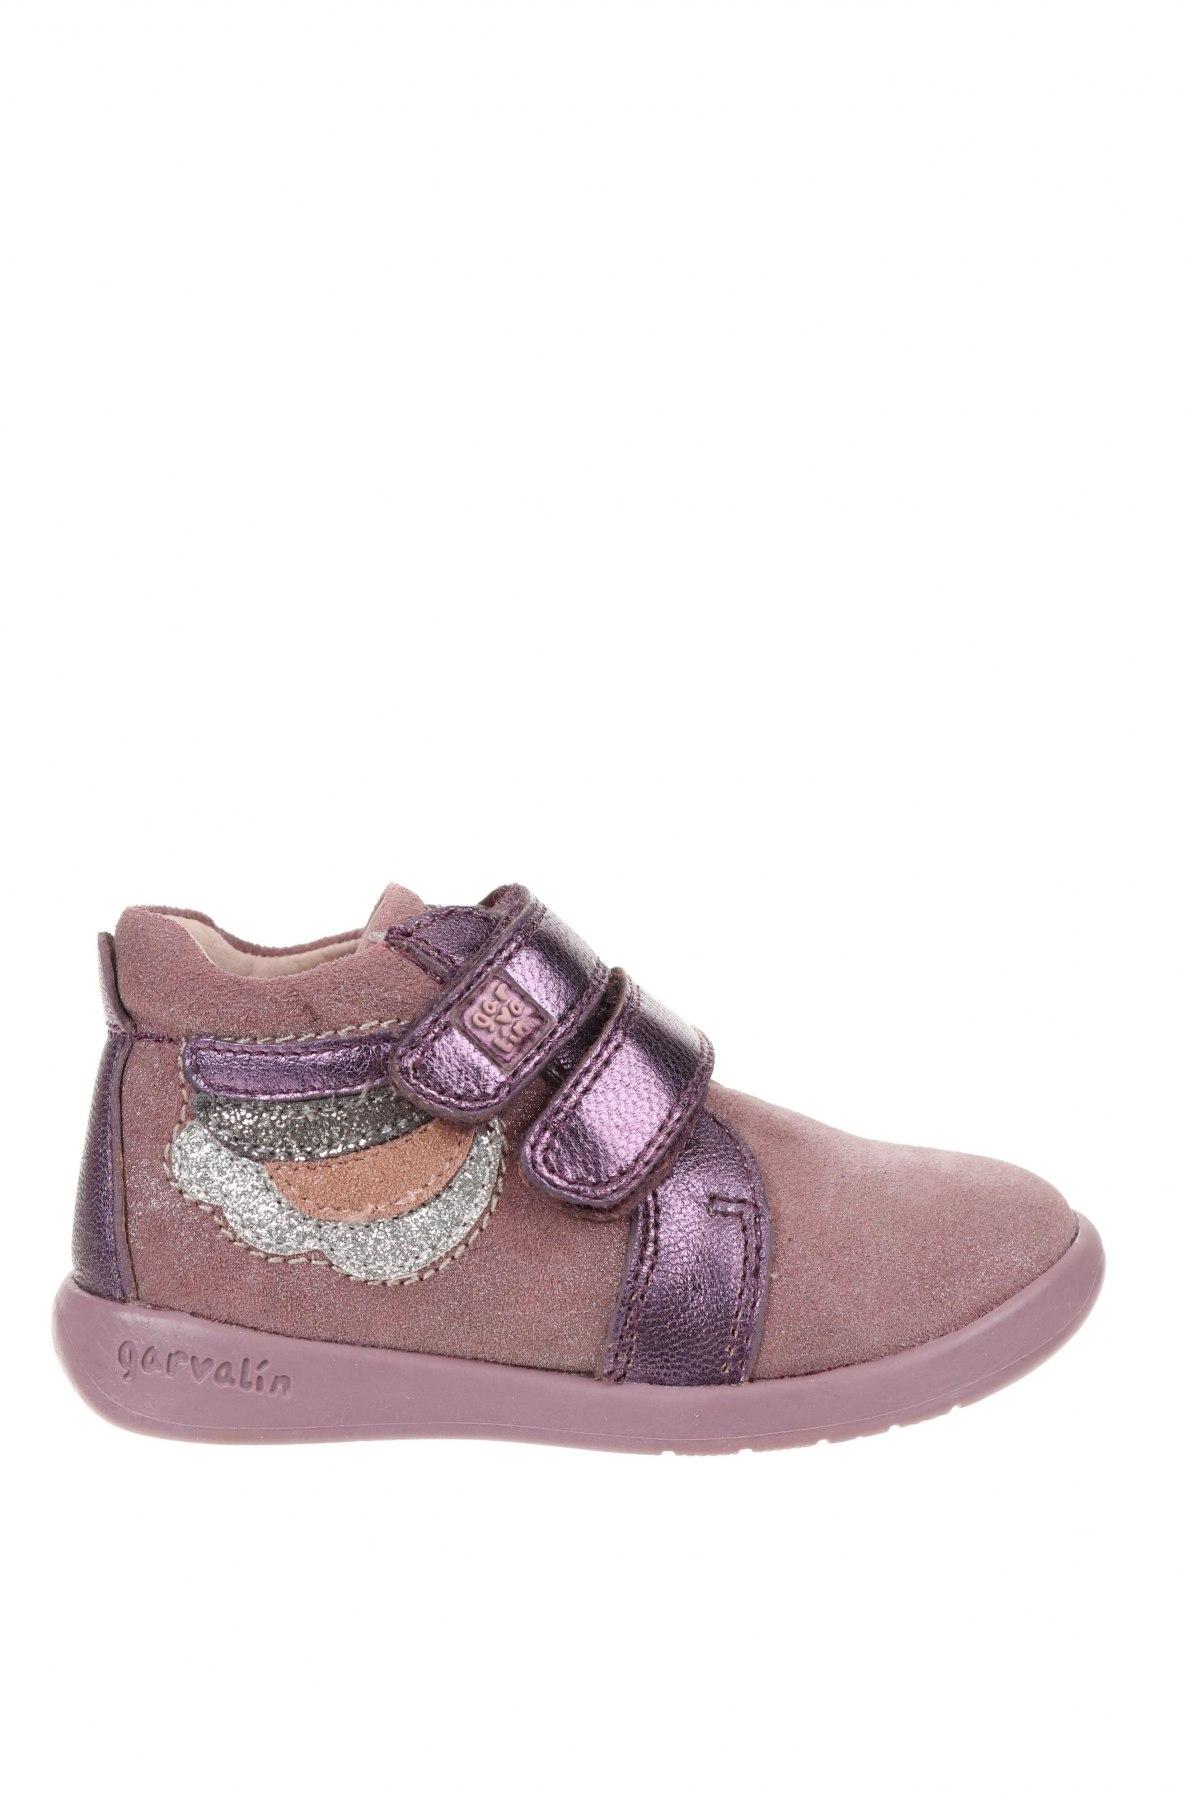 Детски обувки Garvalin, Размер 23, Цвят Лилав, Естествена кожа, естествен велур, Цена 33,60лв.